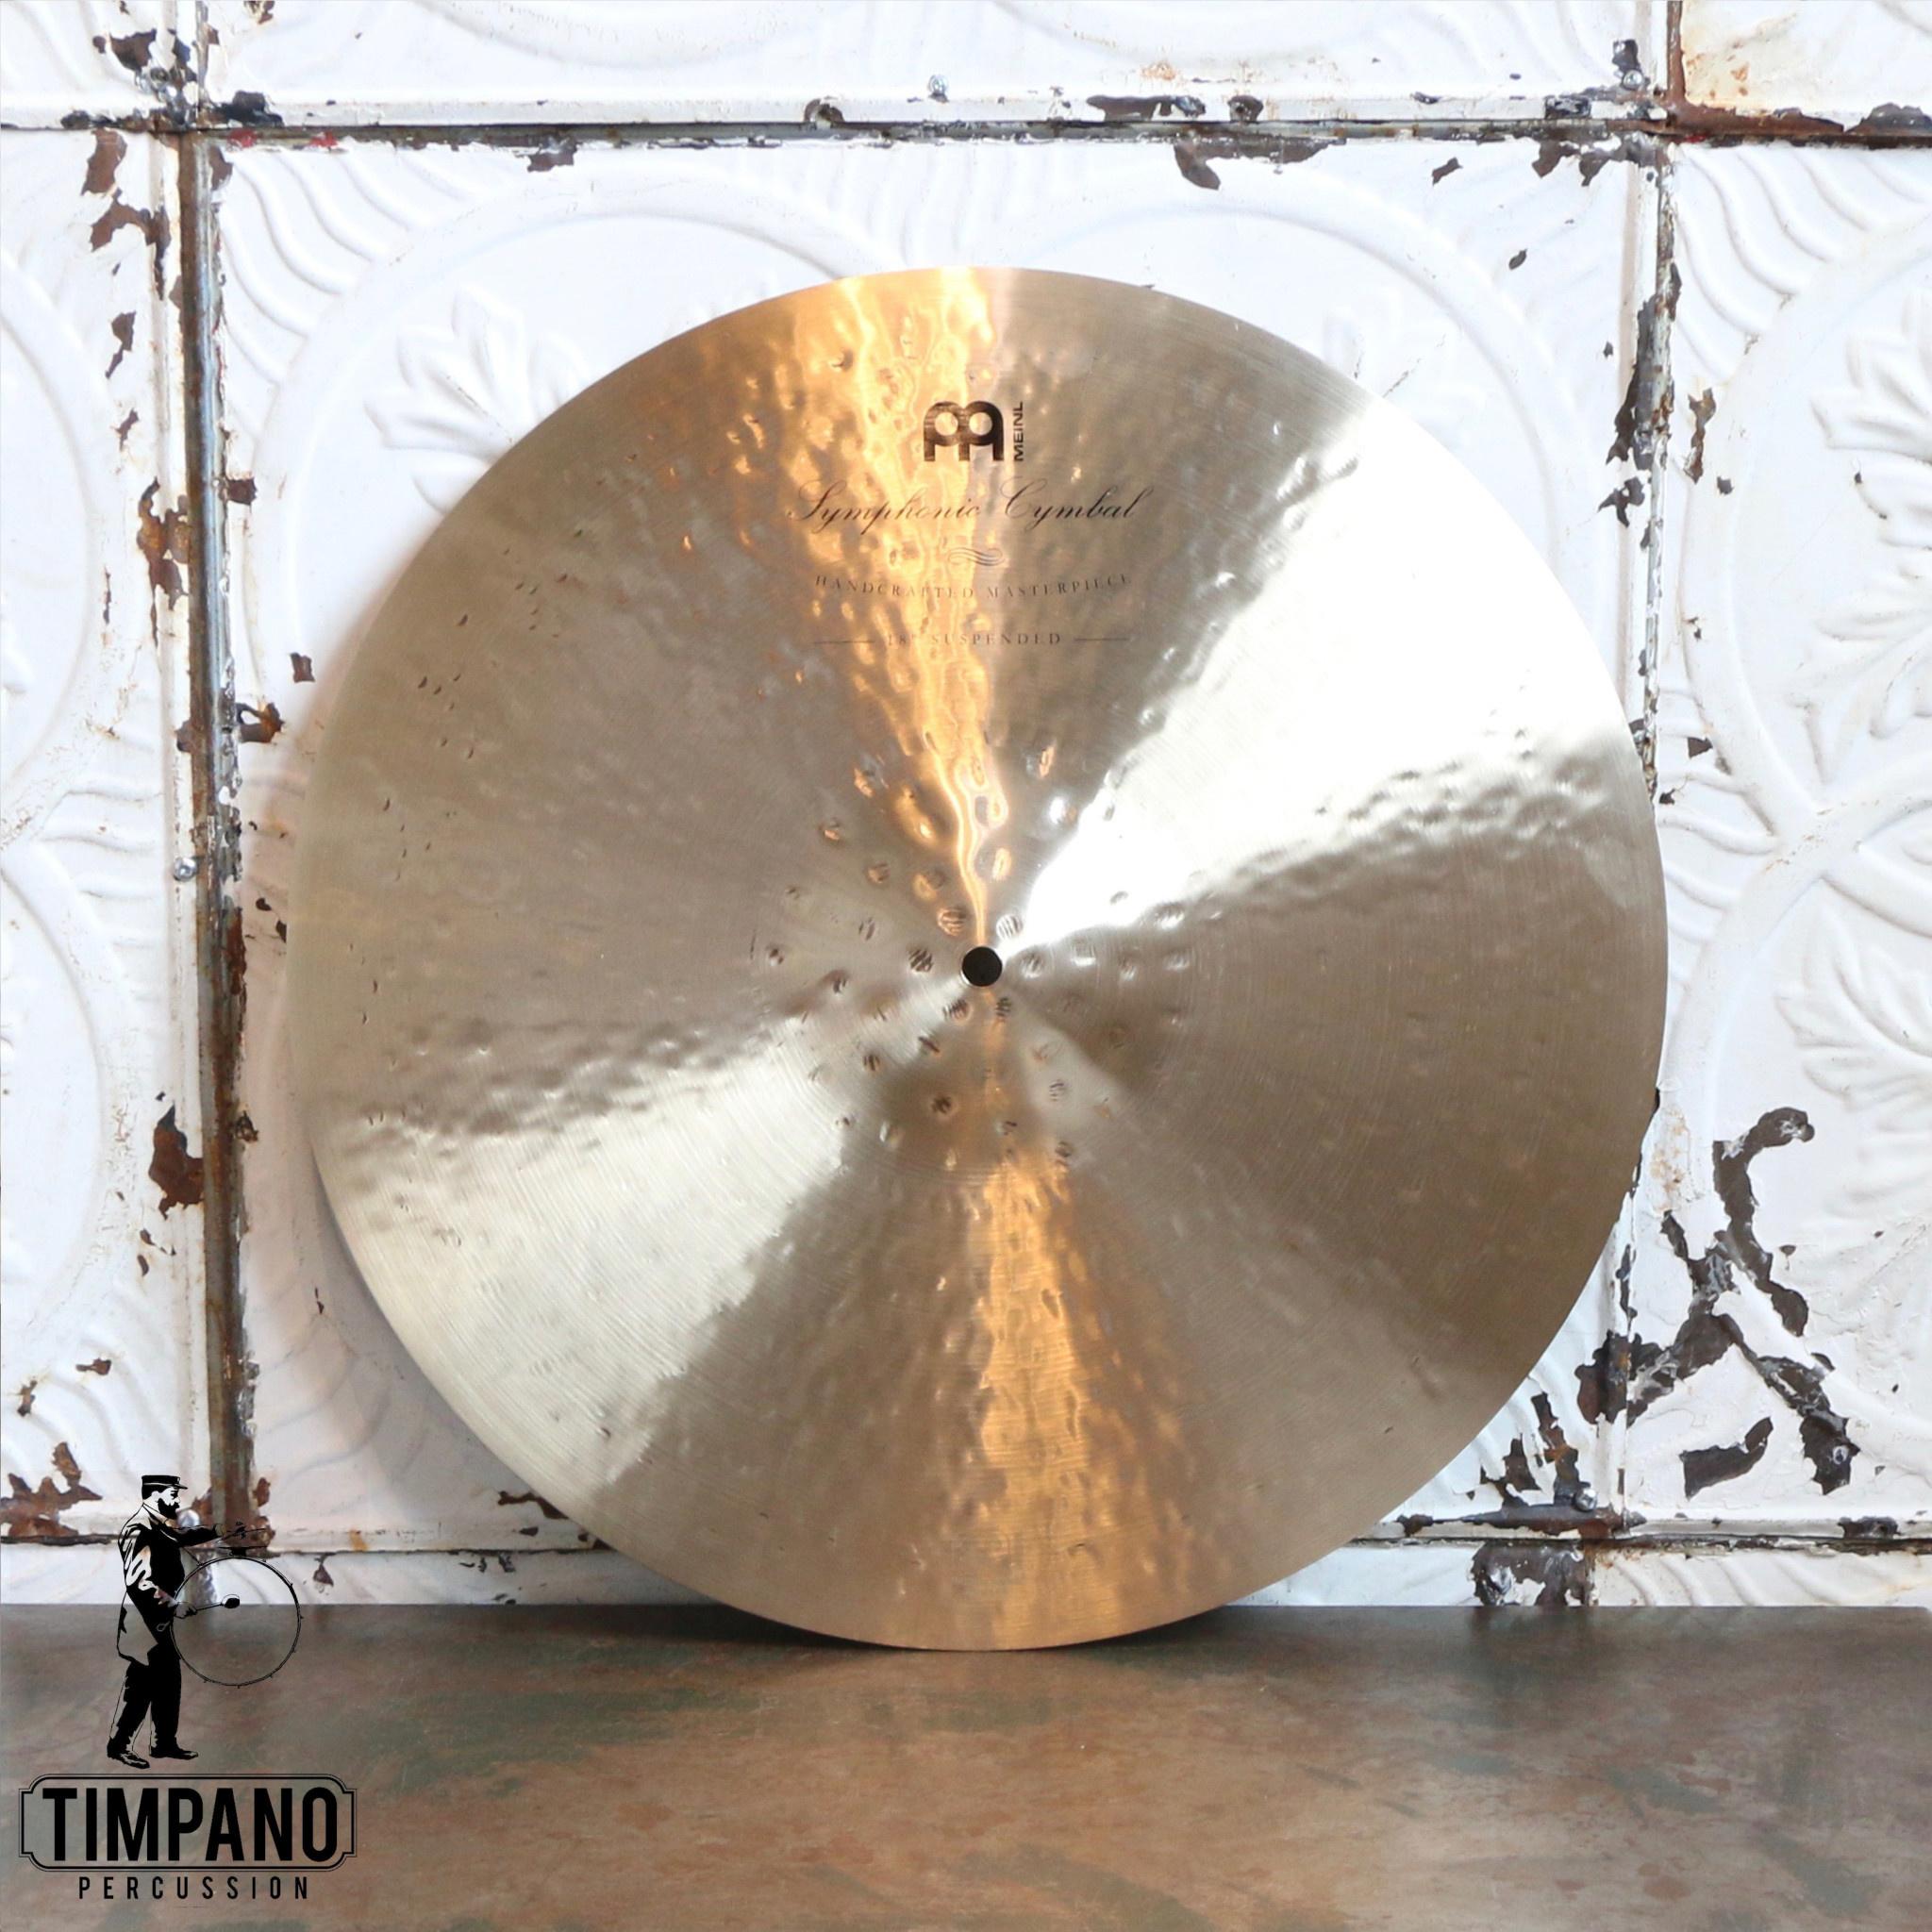 Meinl Cymbale suspendue Meinl Symphonic 18po